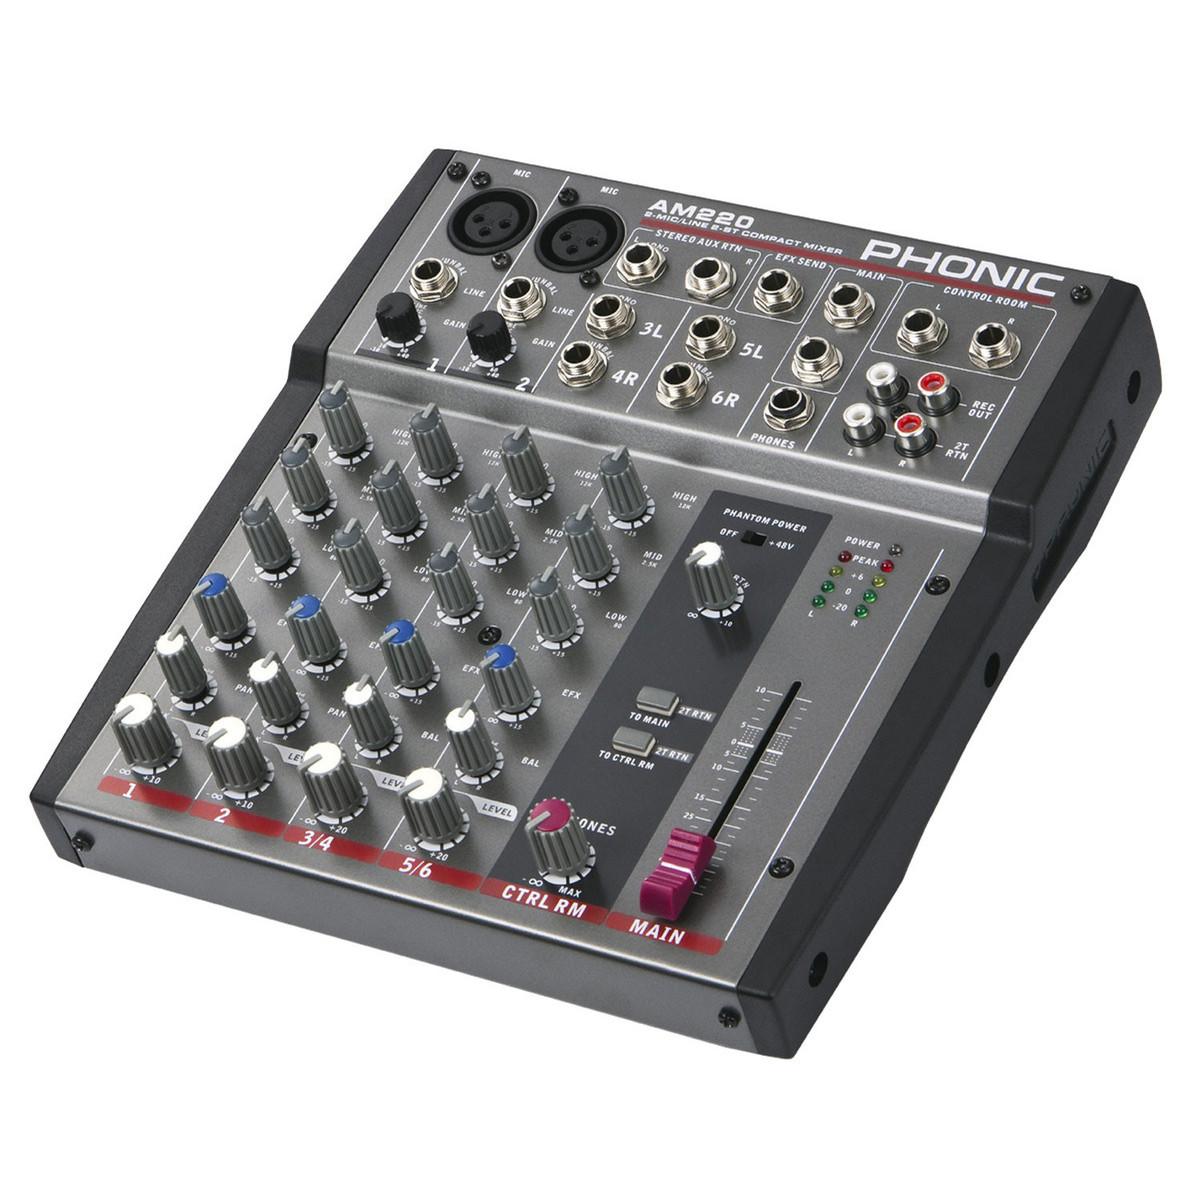 phonic am220 analog mixer at. Black Bedroom Furniture Sets. Home Design Ideas